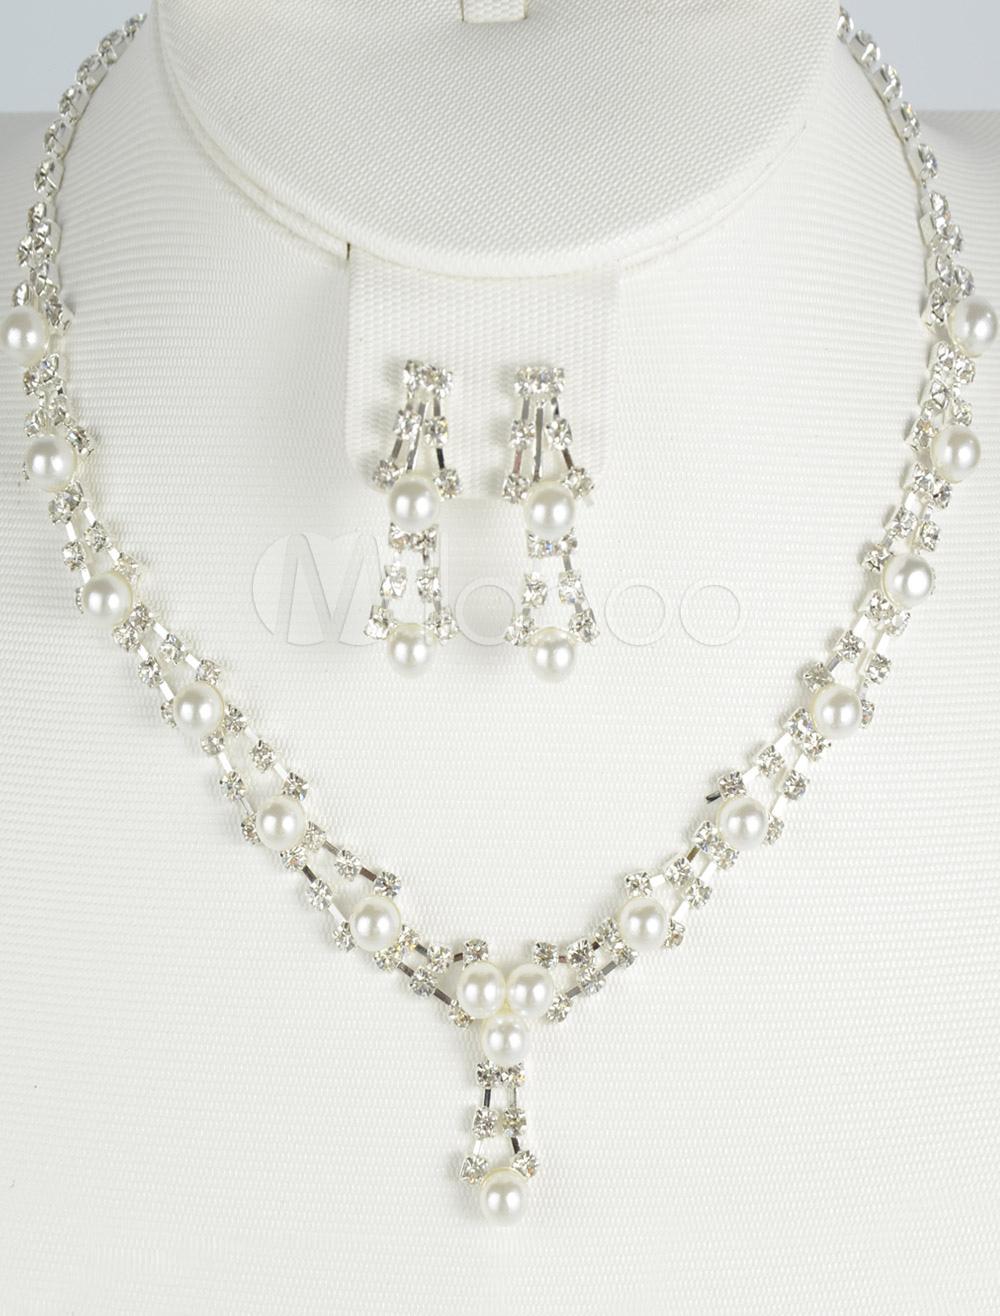 Imitation Pearl Earclip Metal Chic Fashion Wedding Jewelry Set